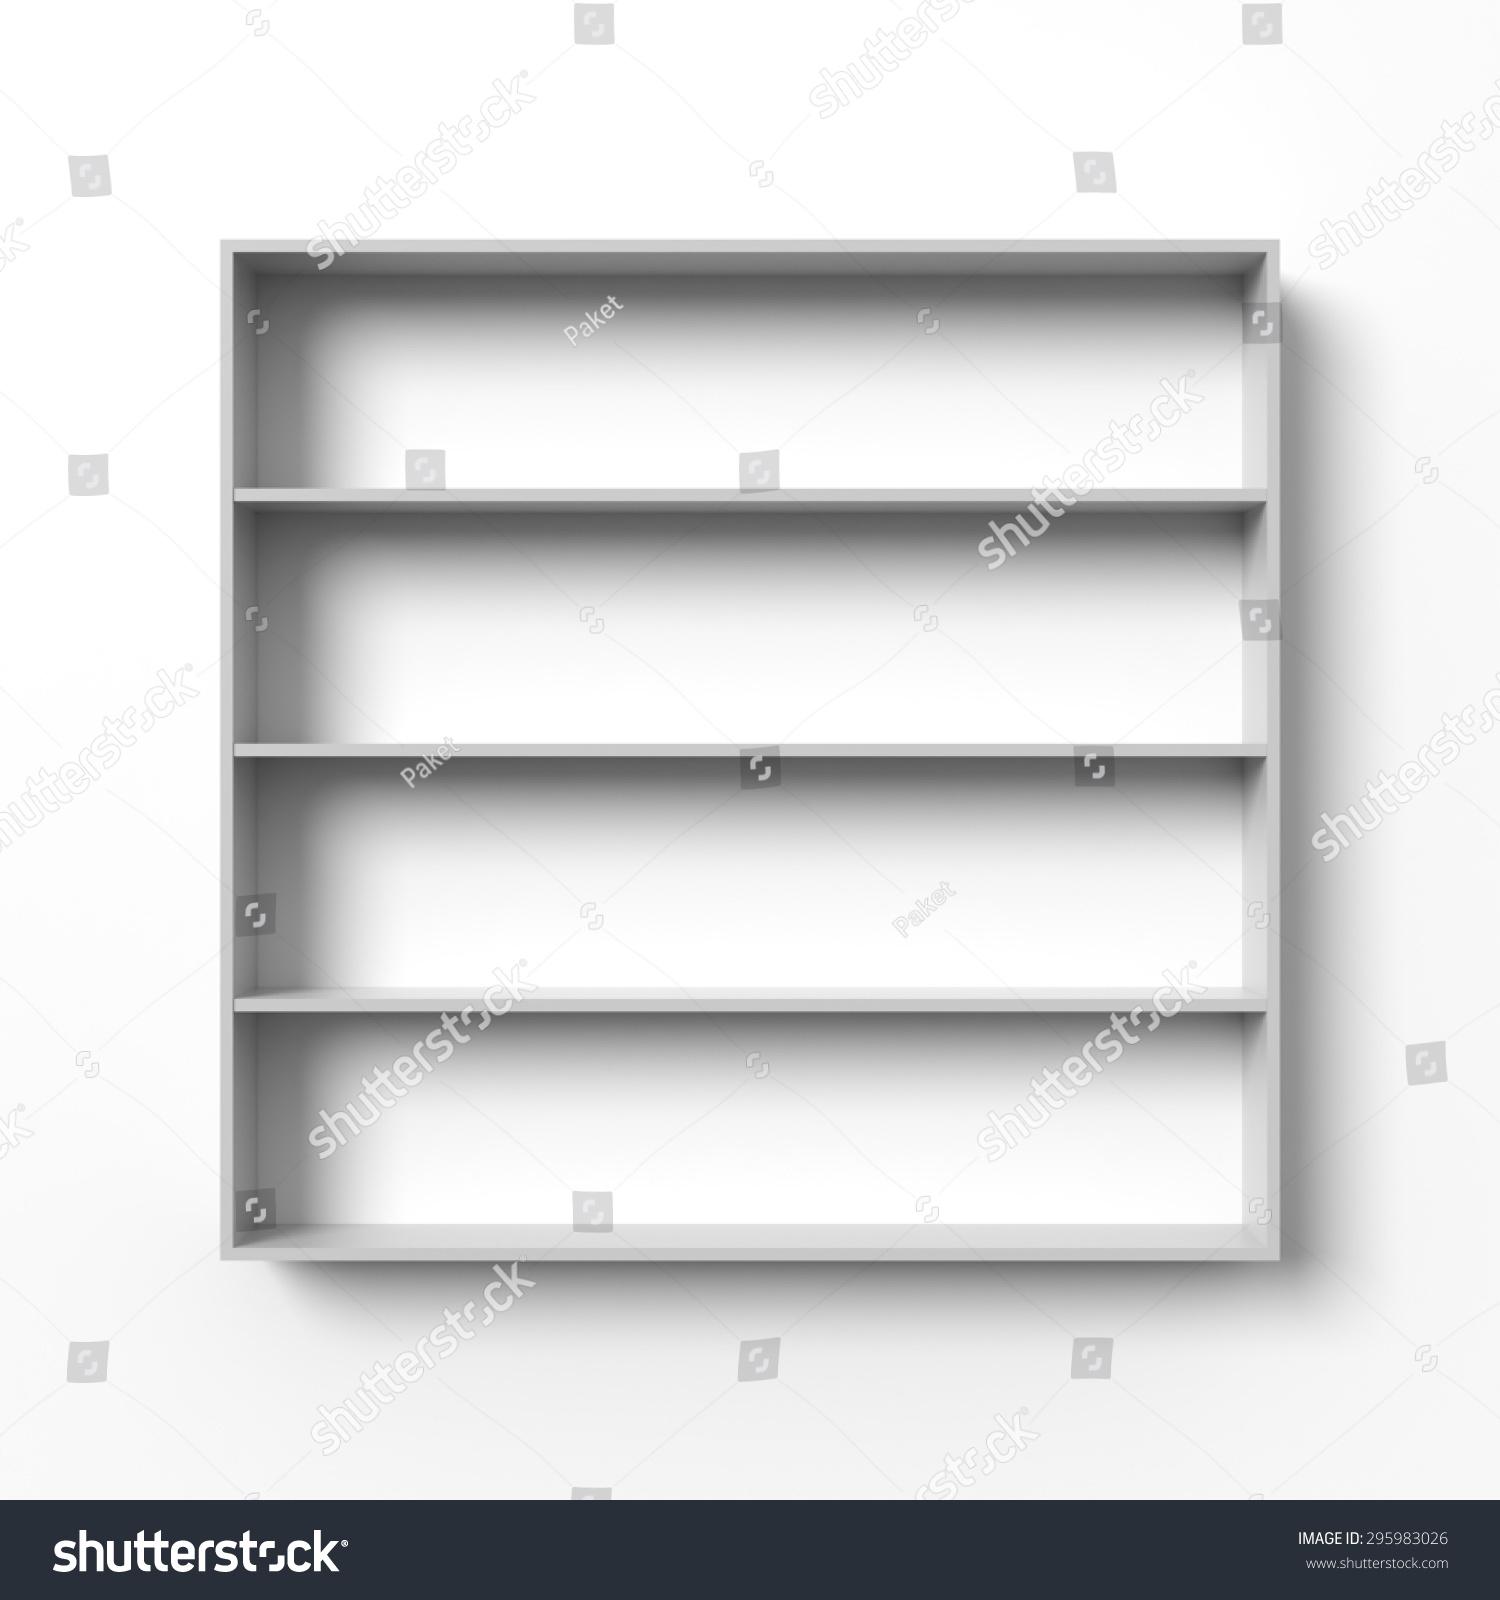 White shelves hanging on wall light stock illustration for How to make a hanging bookshelf